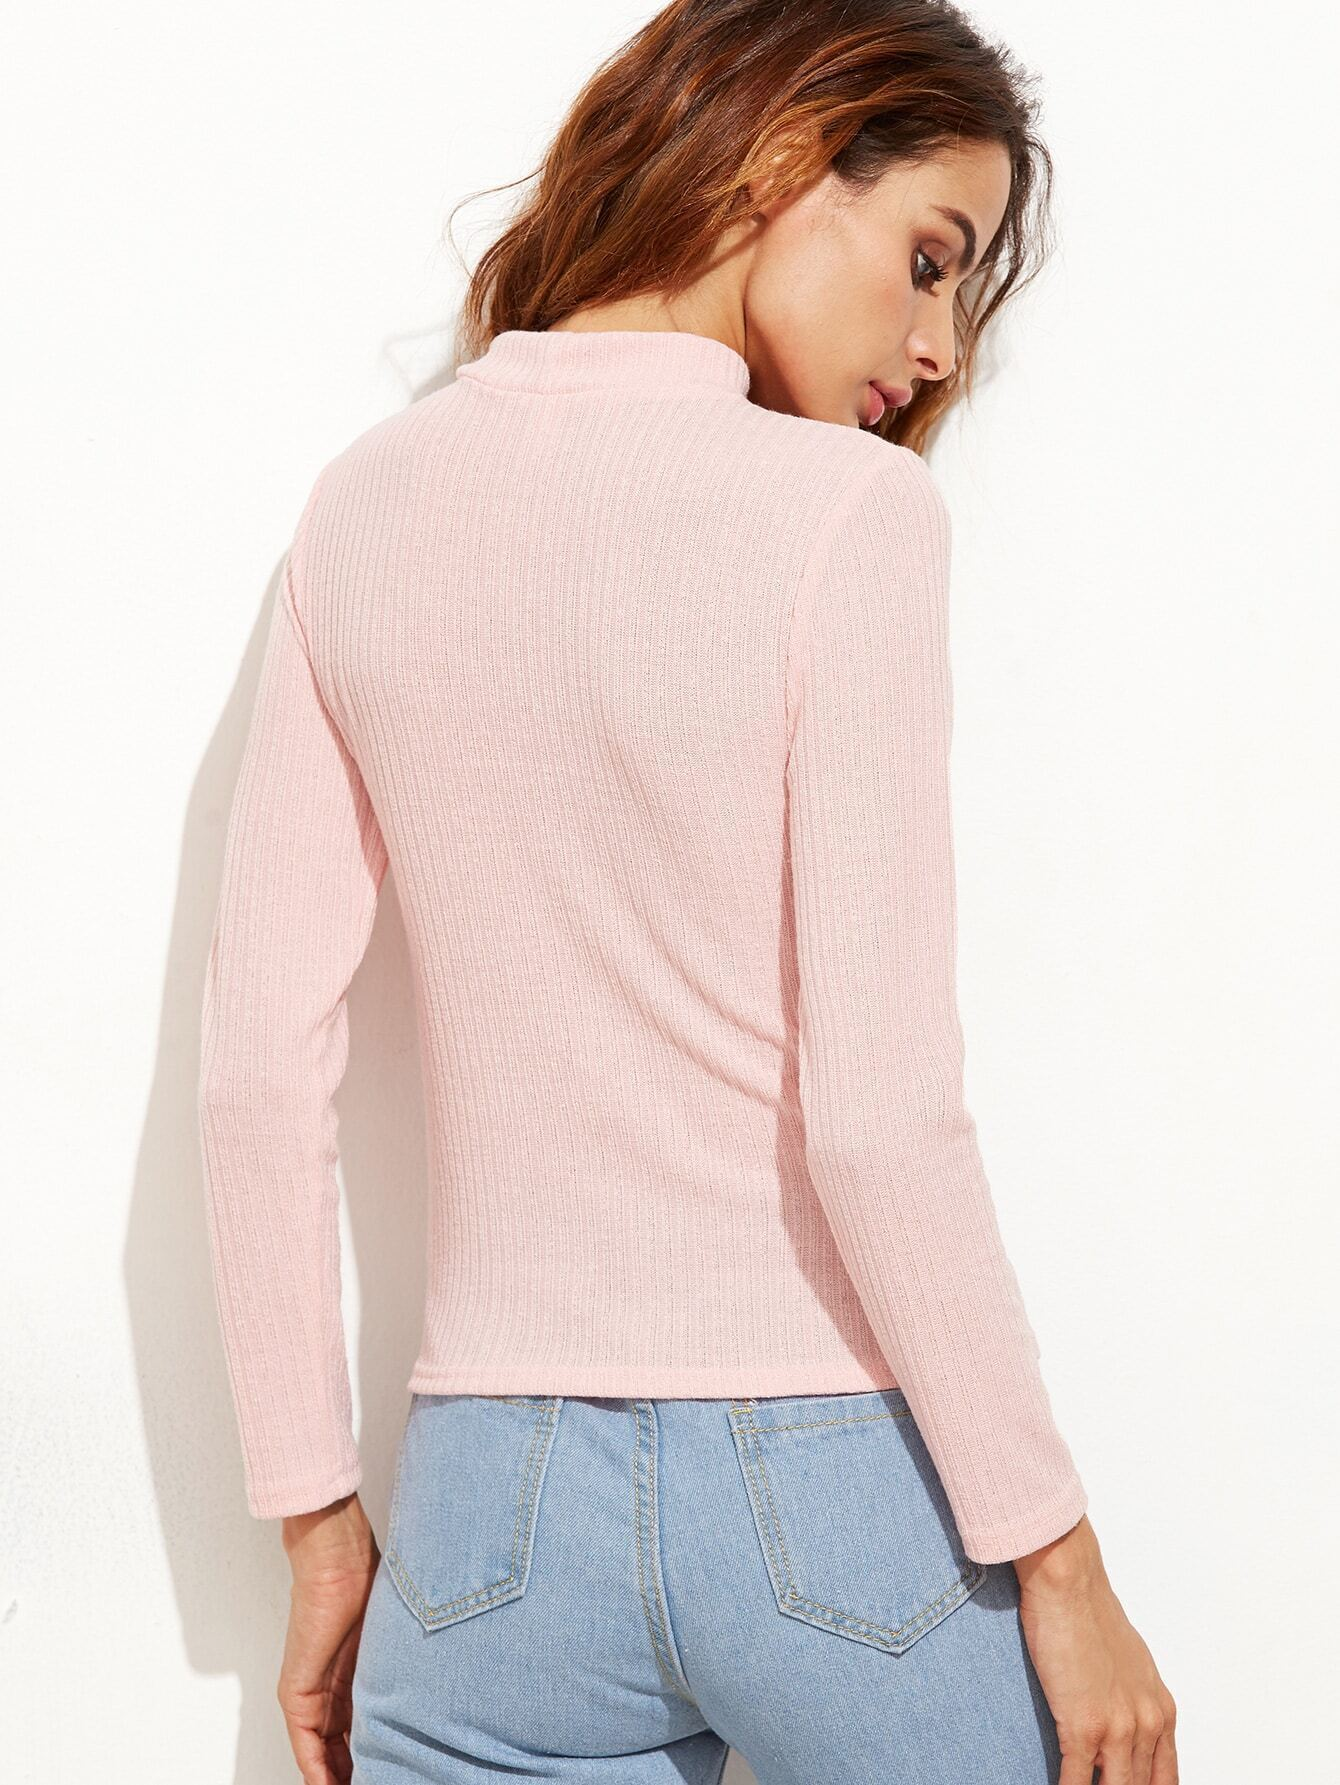 sweater161003101_2